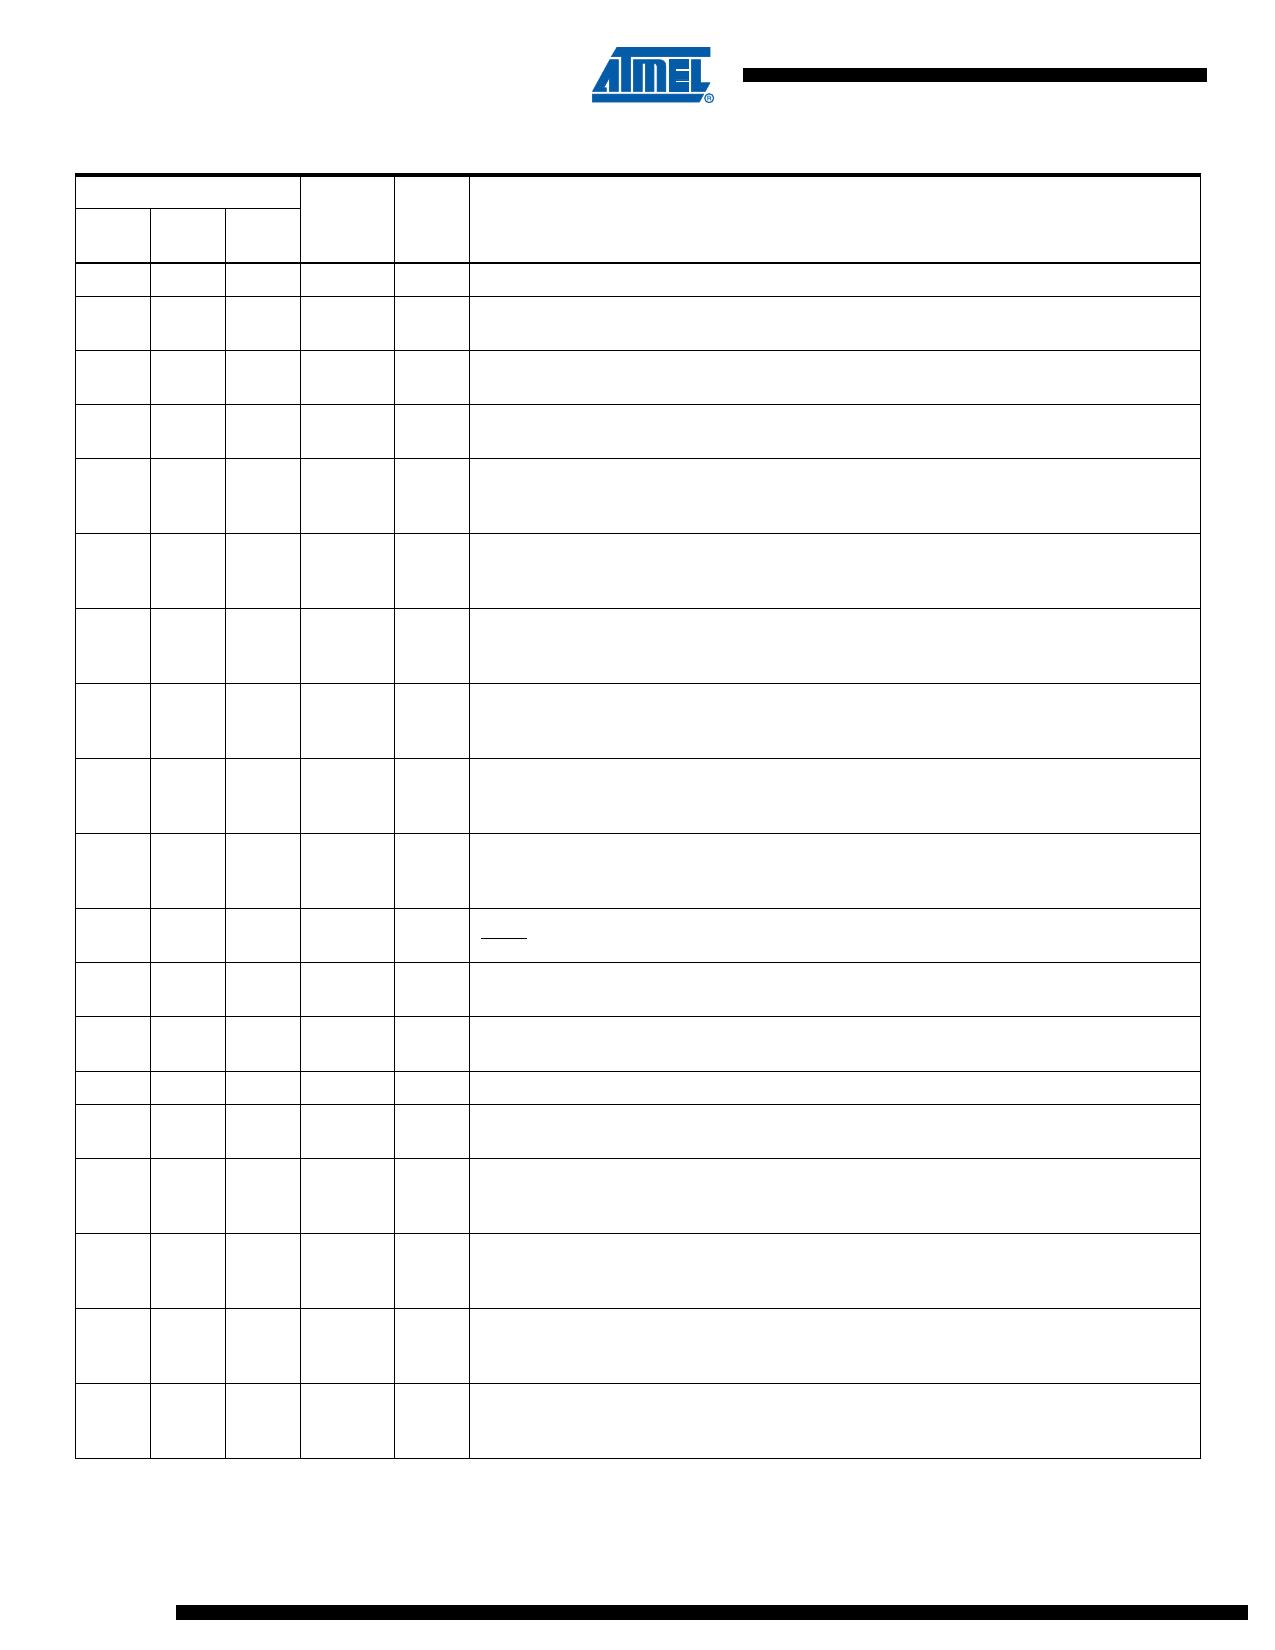 AT89LP51ED2 pdf, 반도체, 판매, 대치품